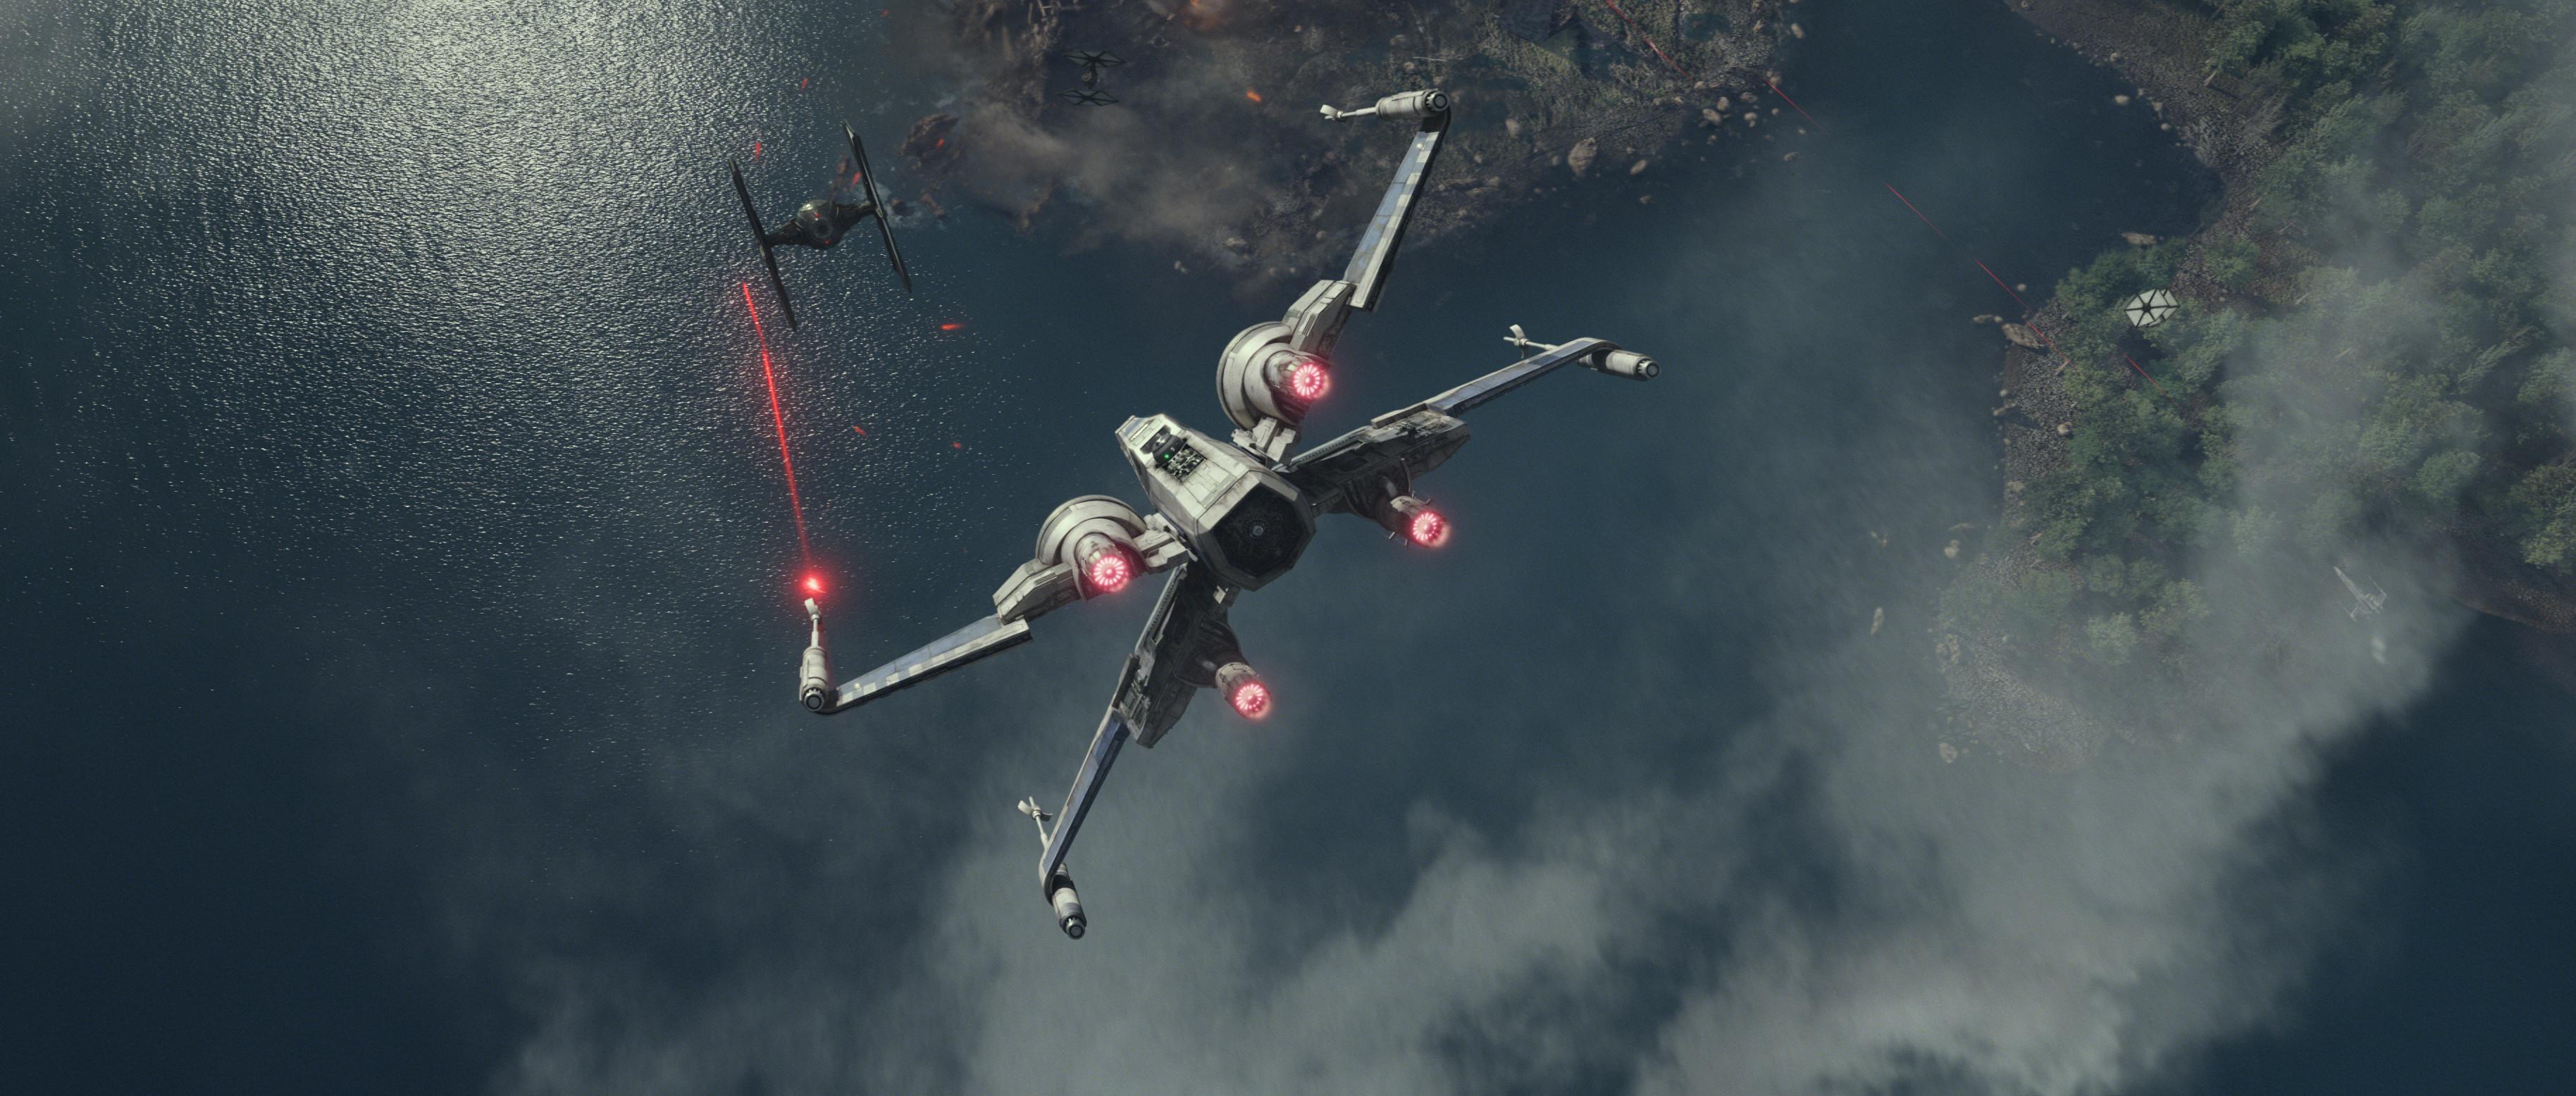 star-wars-force-awakens-x-wing